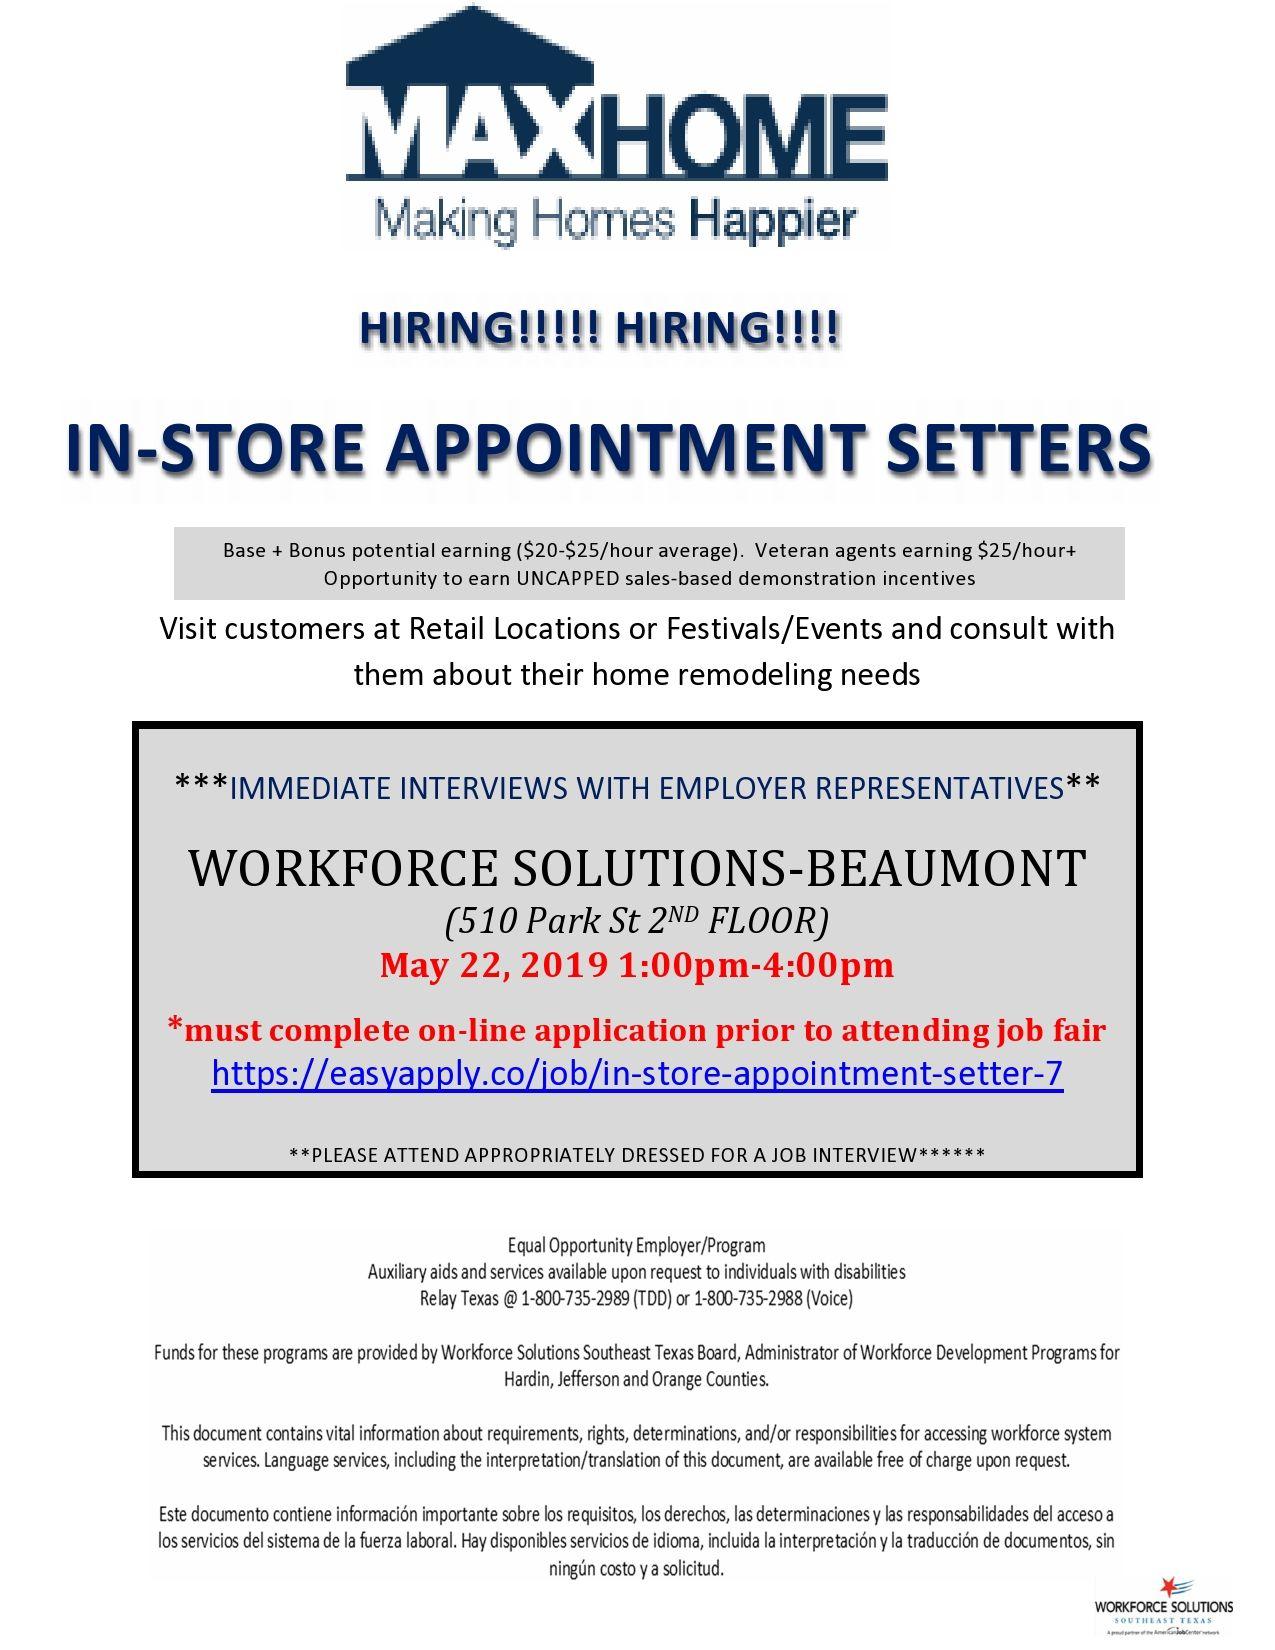 Career fair may 22 in beaumont tx texas jobs job